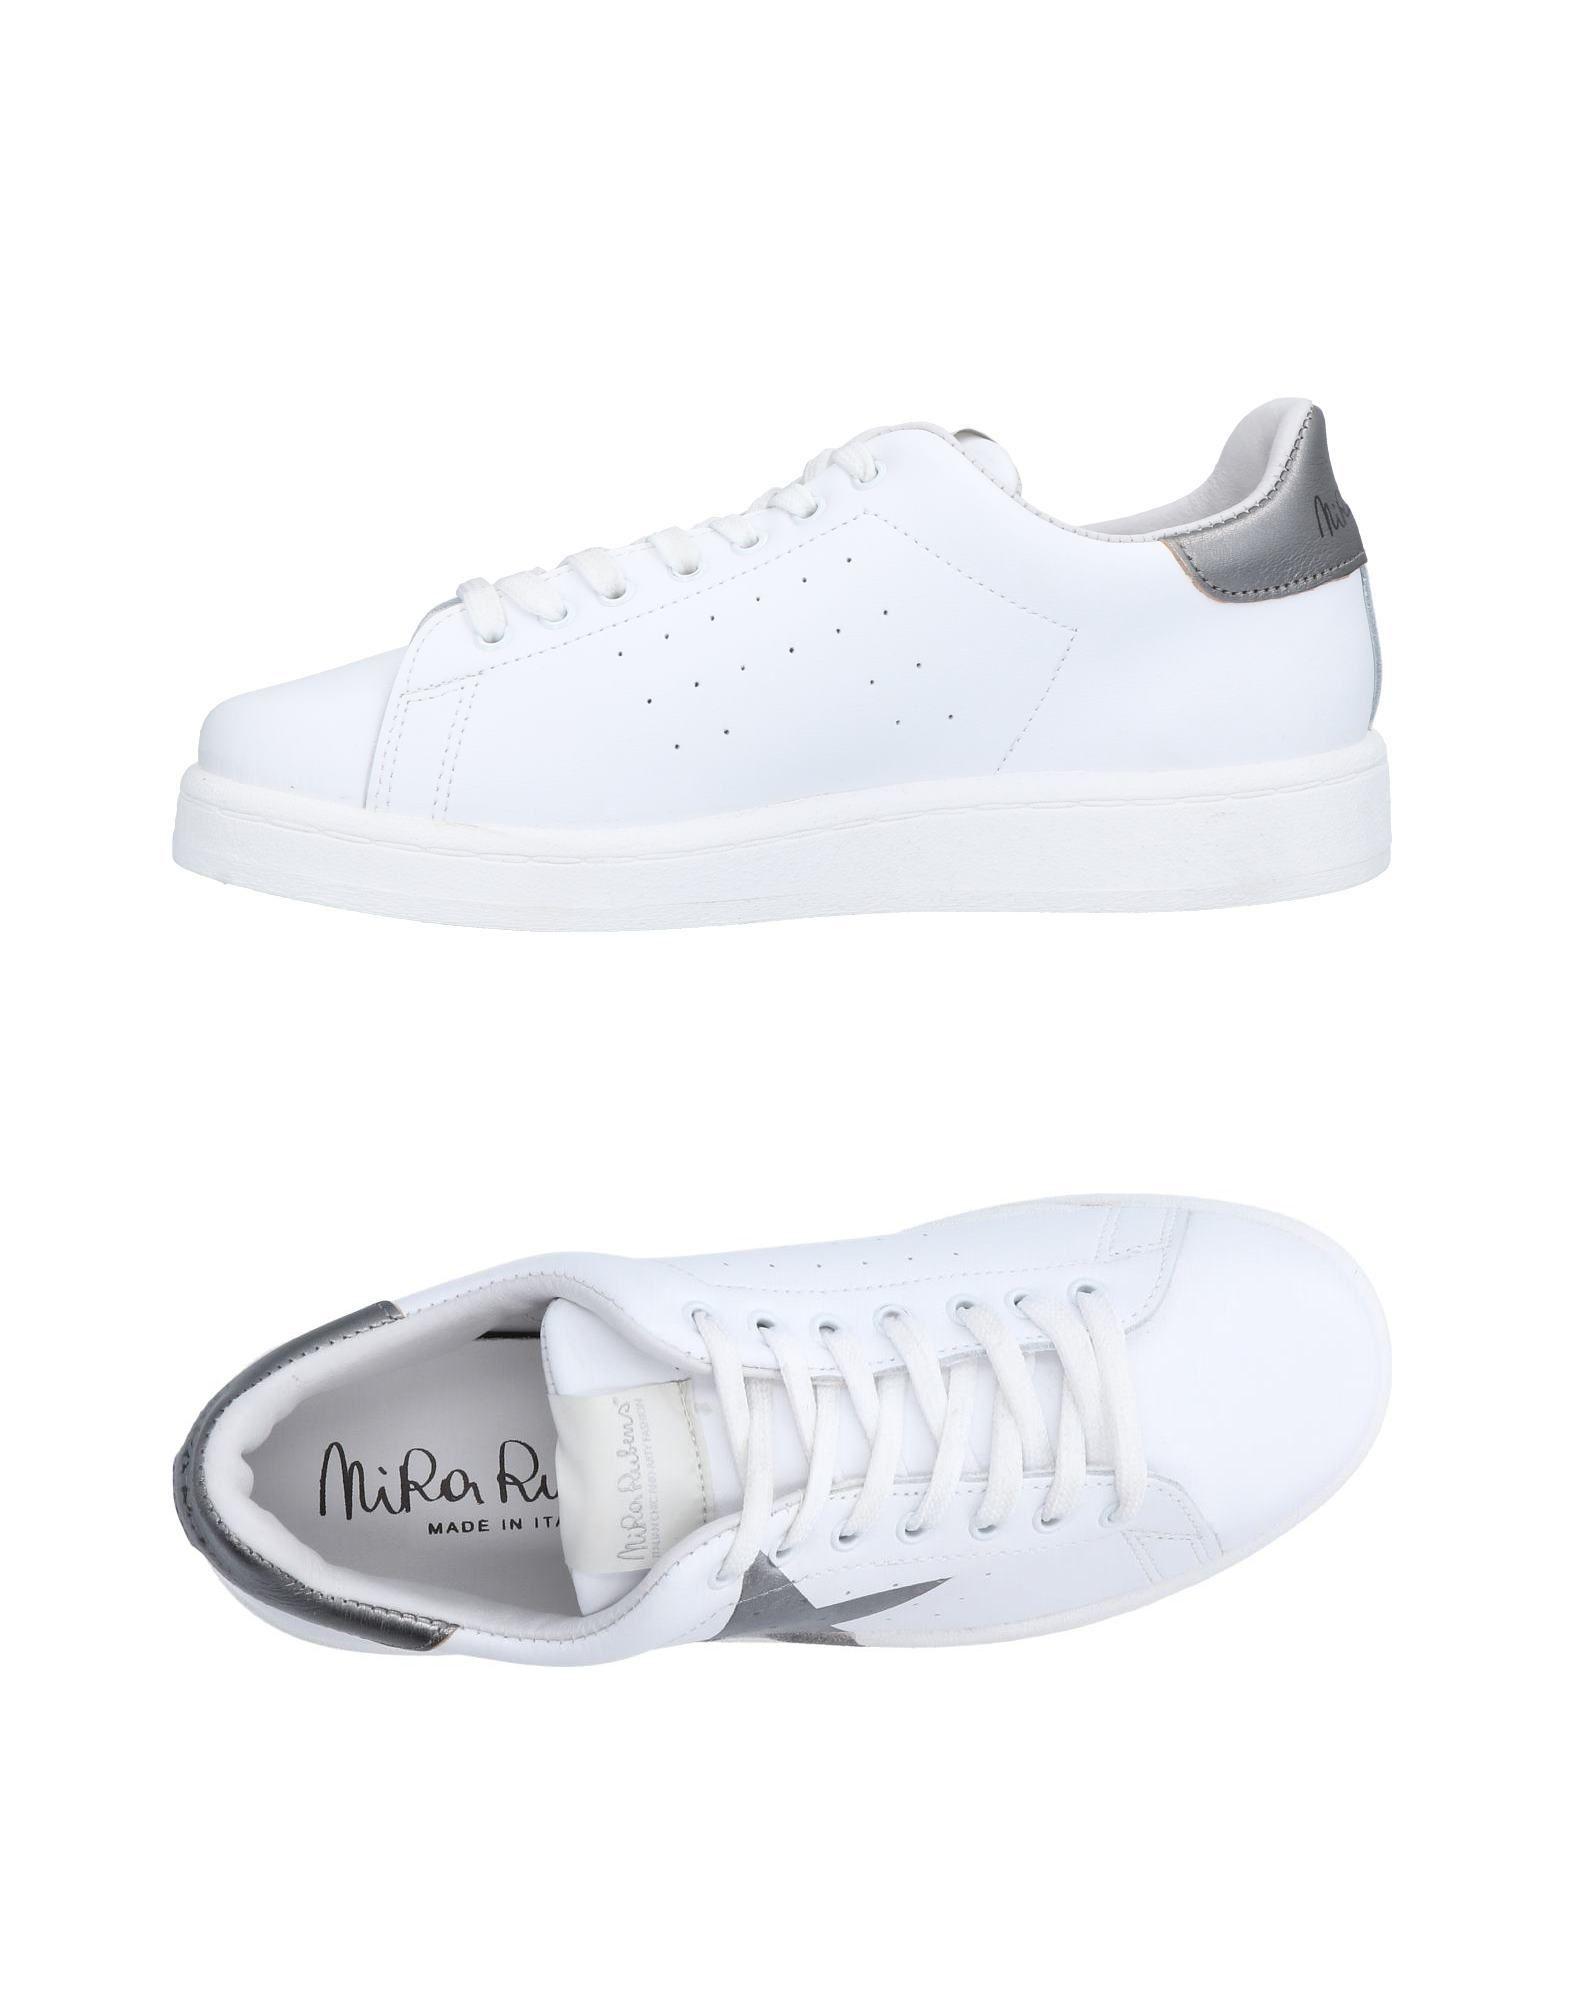 Nira on Rubens Sneakers - Men Nira Rubens Sneakers online on Nira  Canada - 11480349WS dcc15c